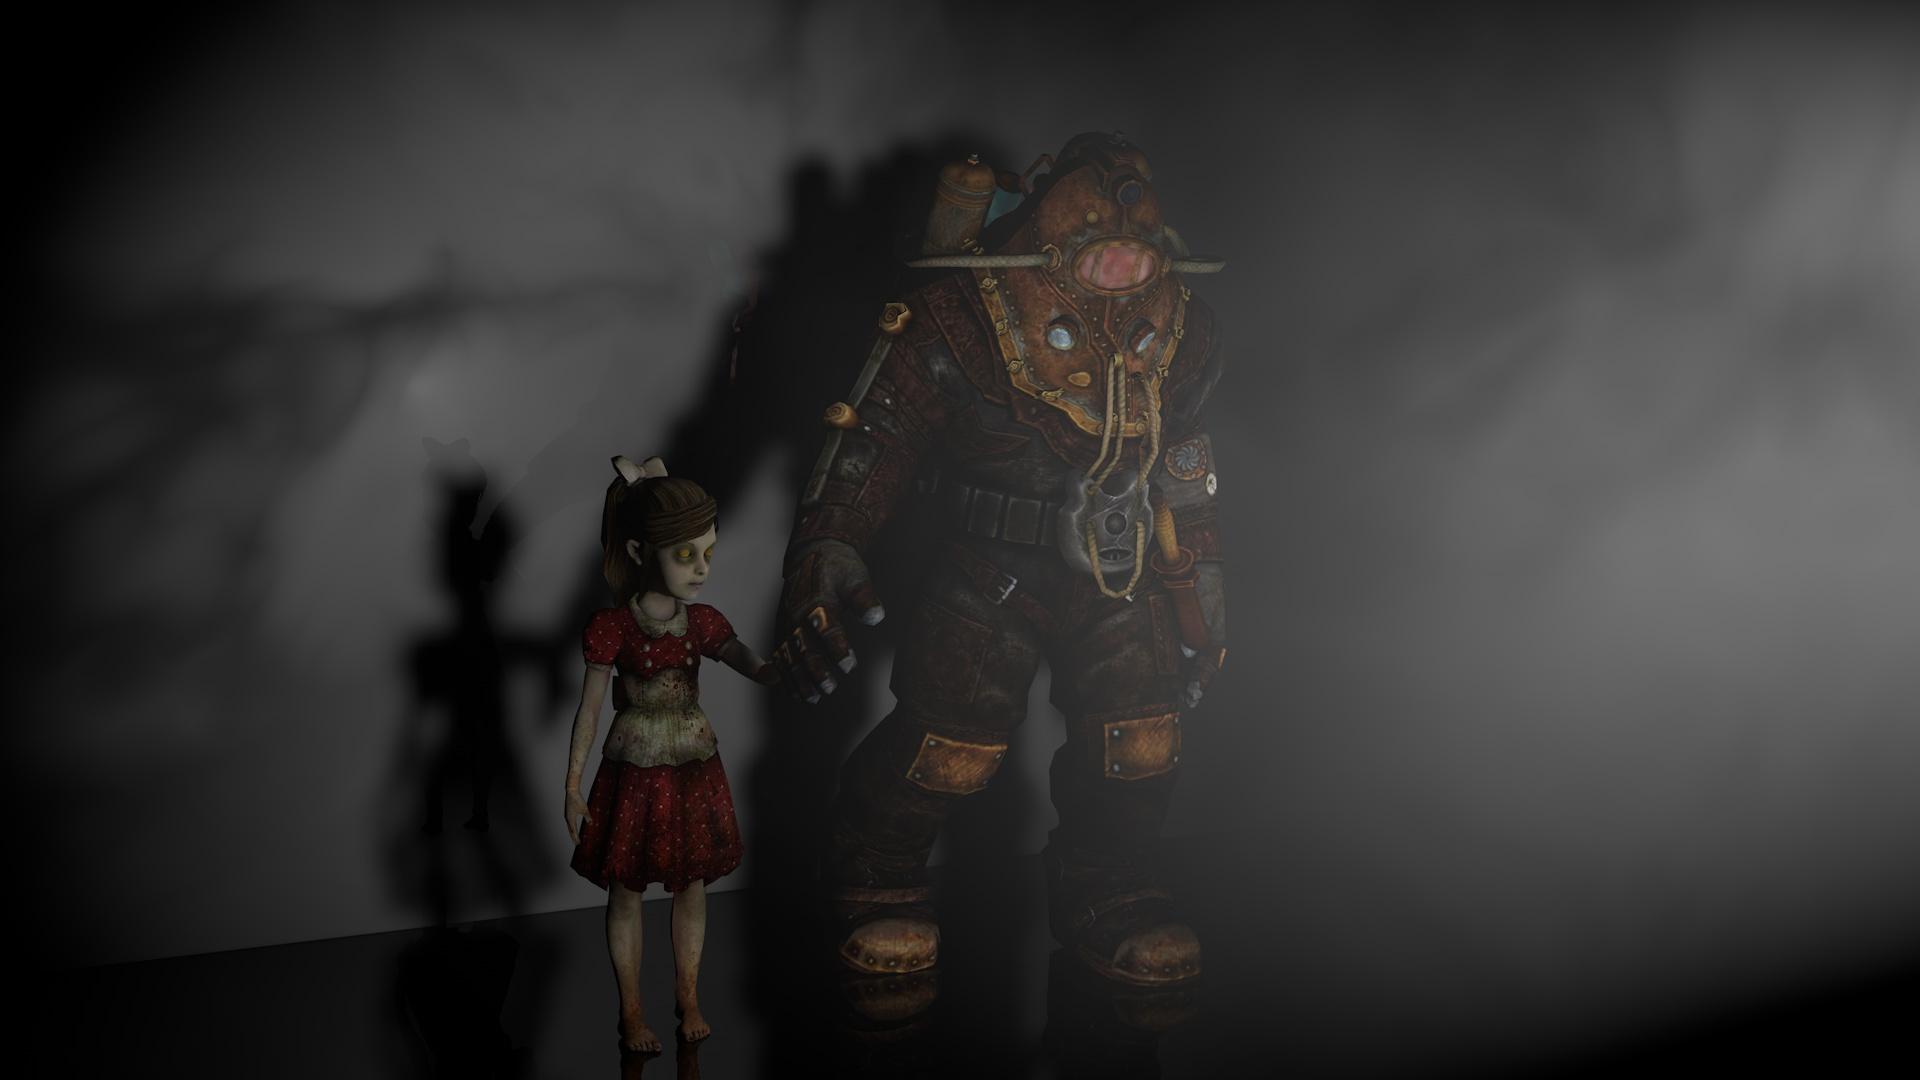 Big Daddy Little Sister Bioshock 2 By Welshboy99 On Deviantart